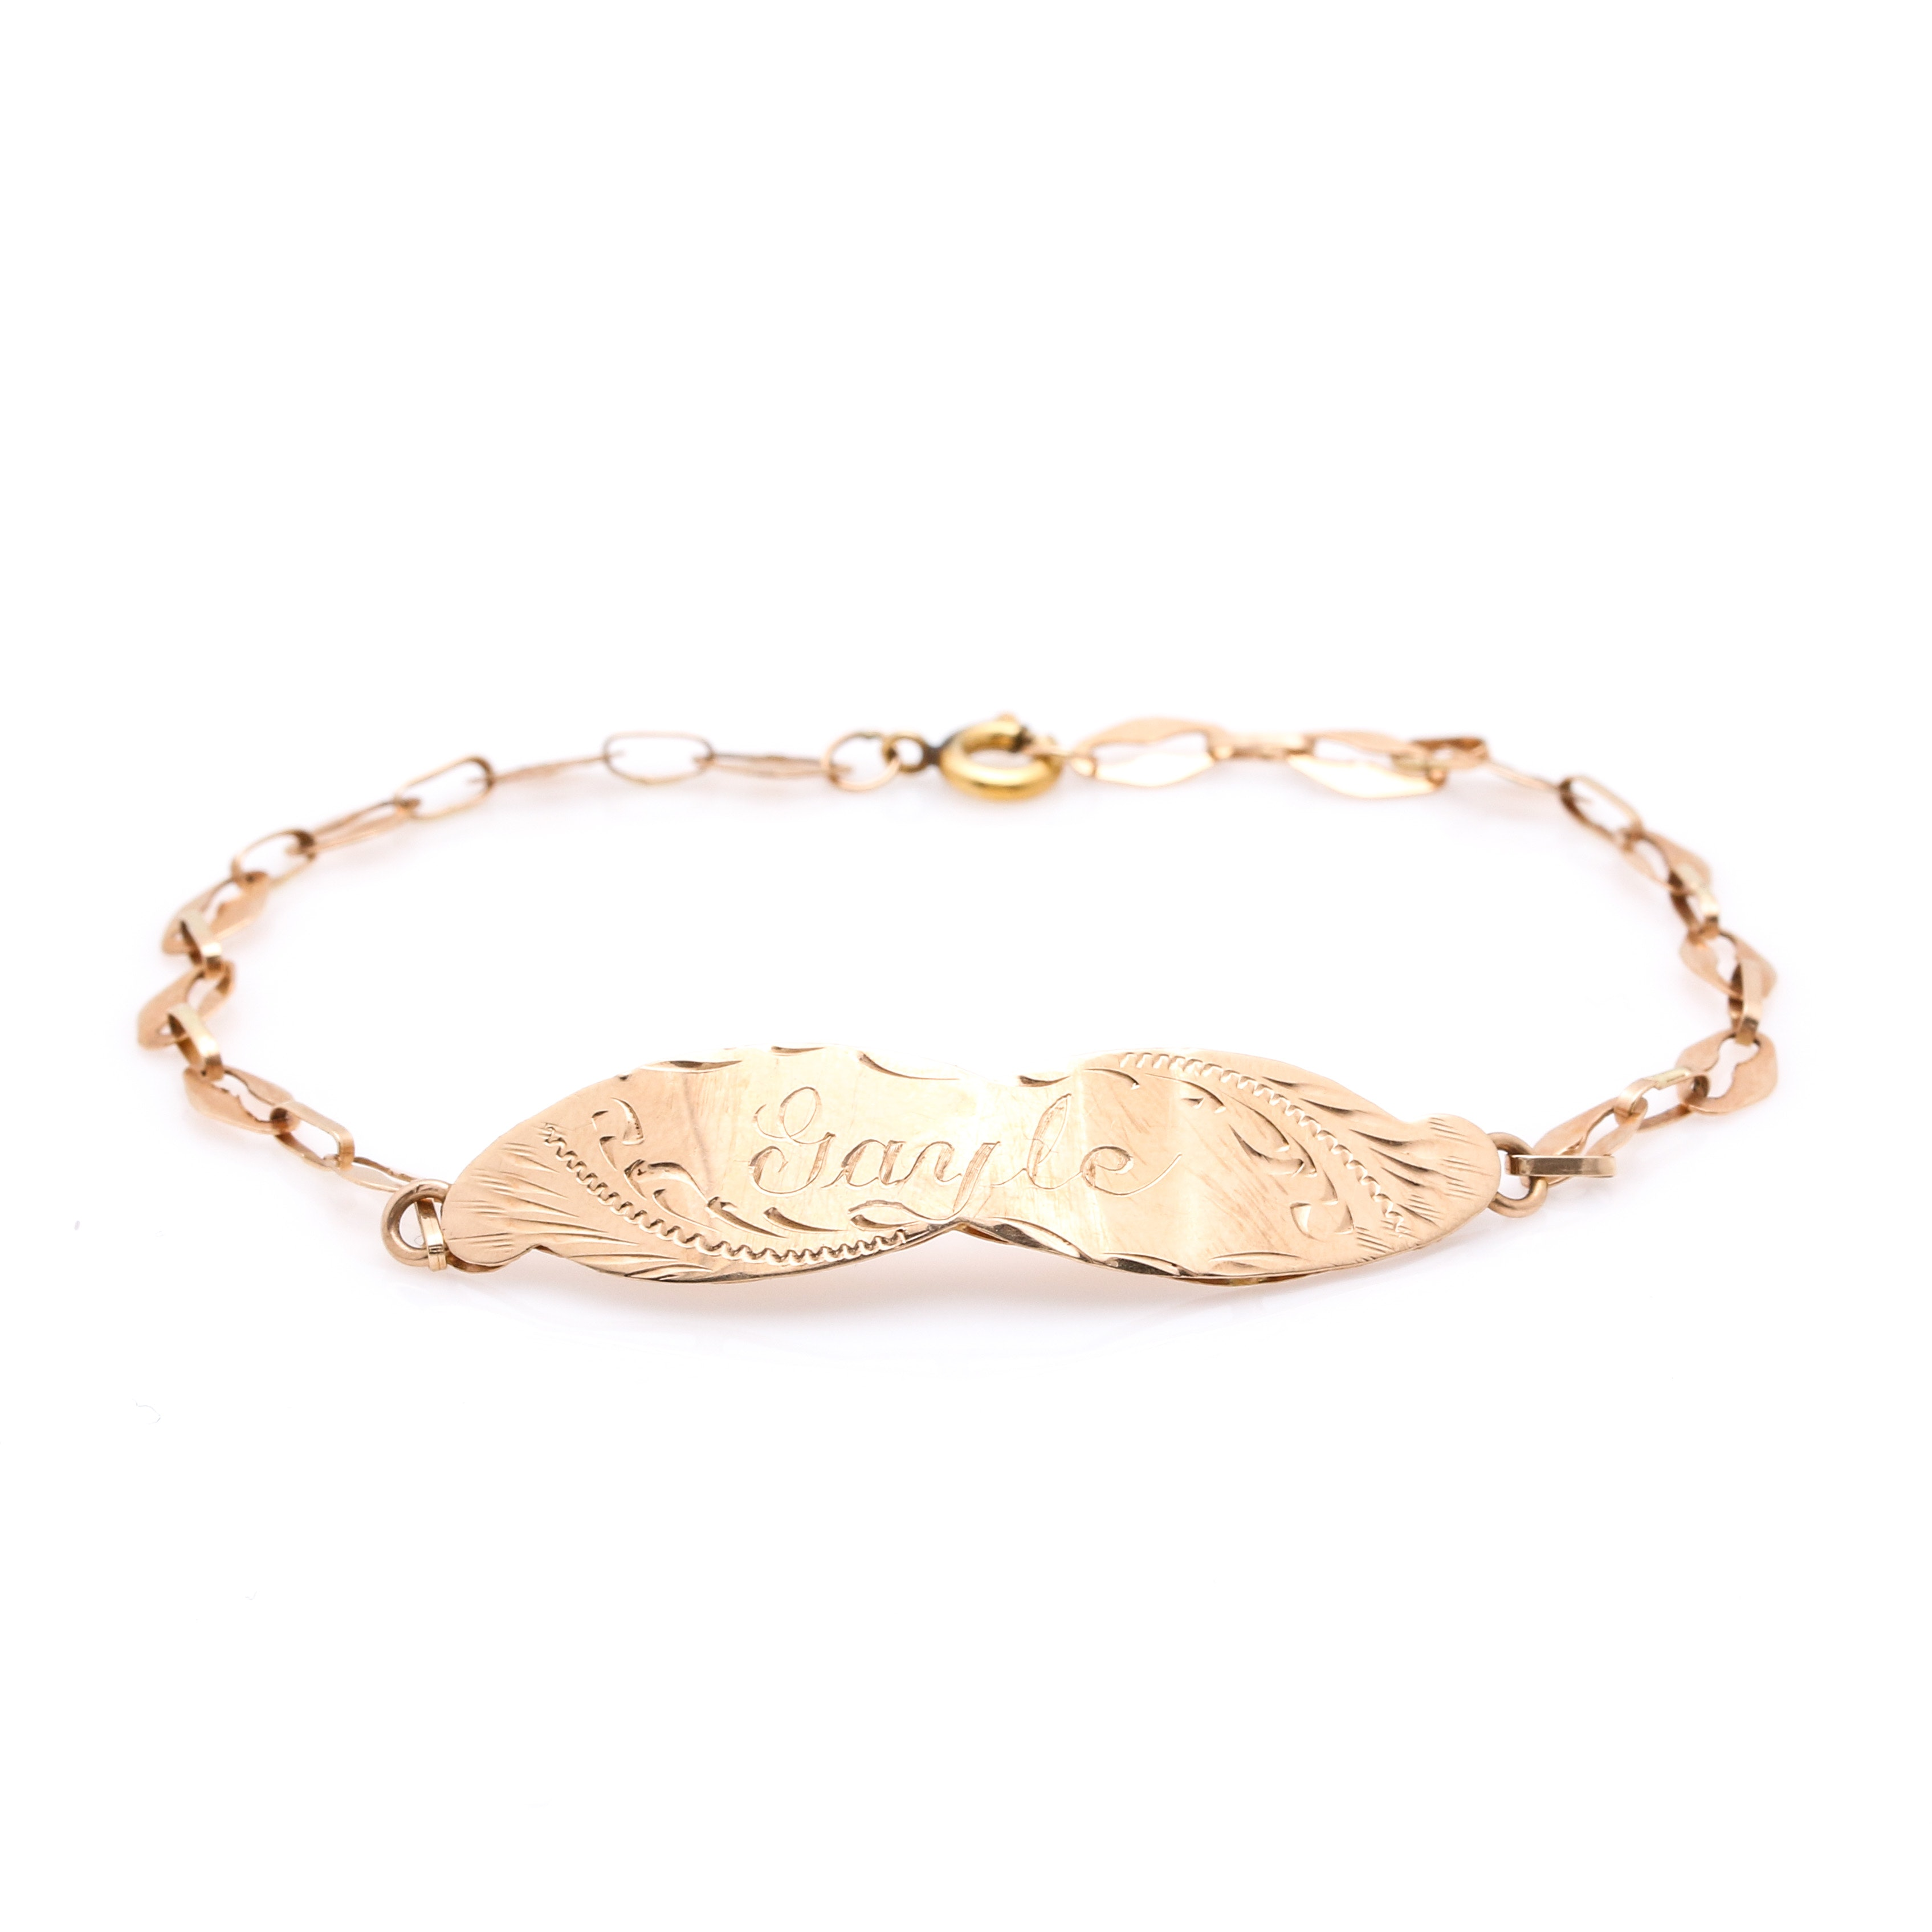 14K Yellow Gold Engraved Bracelet